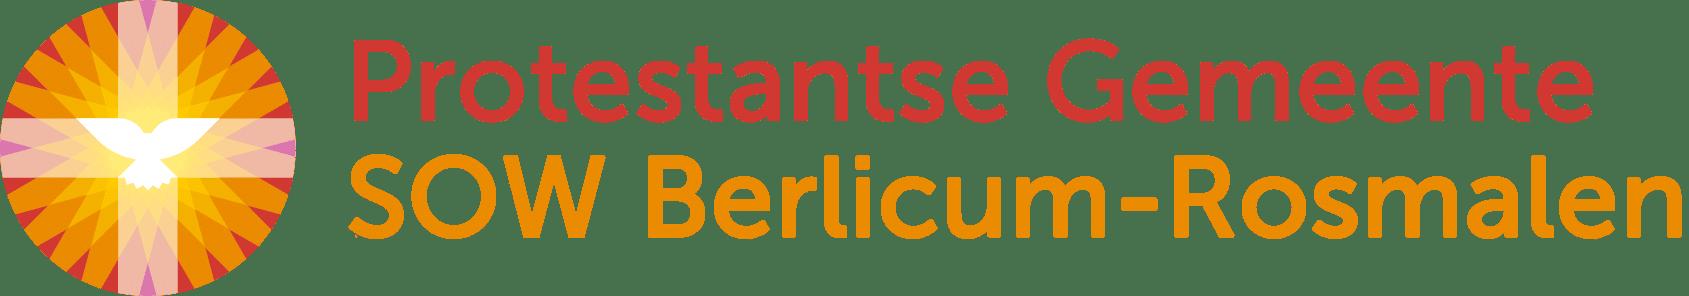 Protestantse Gemeente SOW Berlicum-Rosmalen